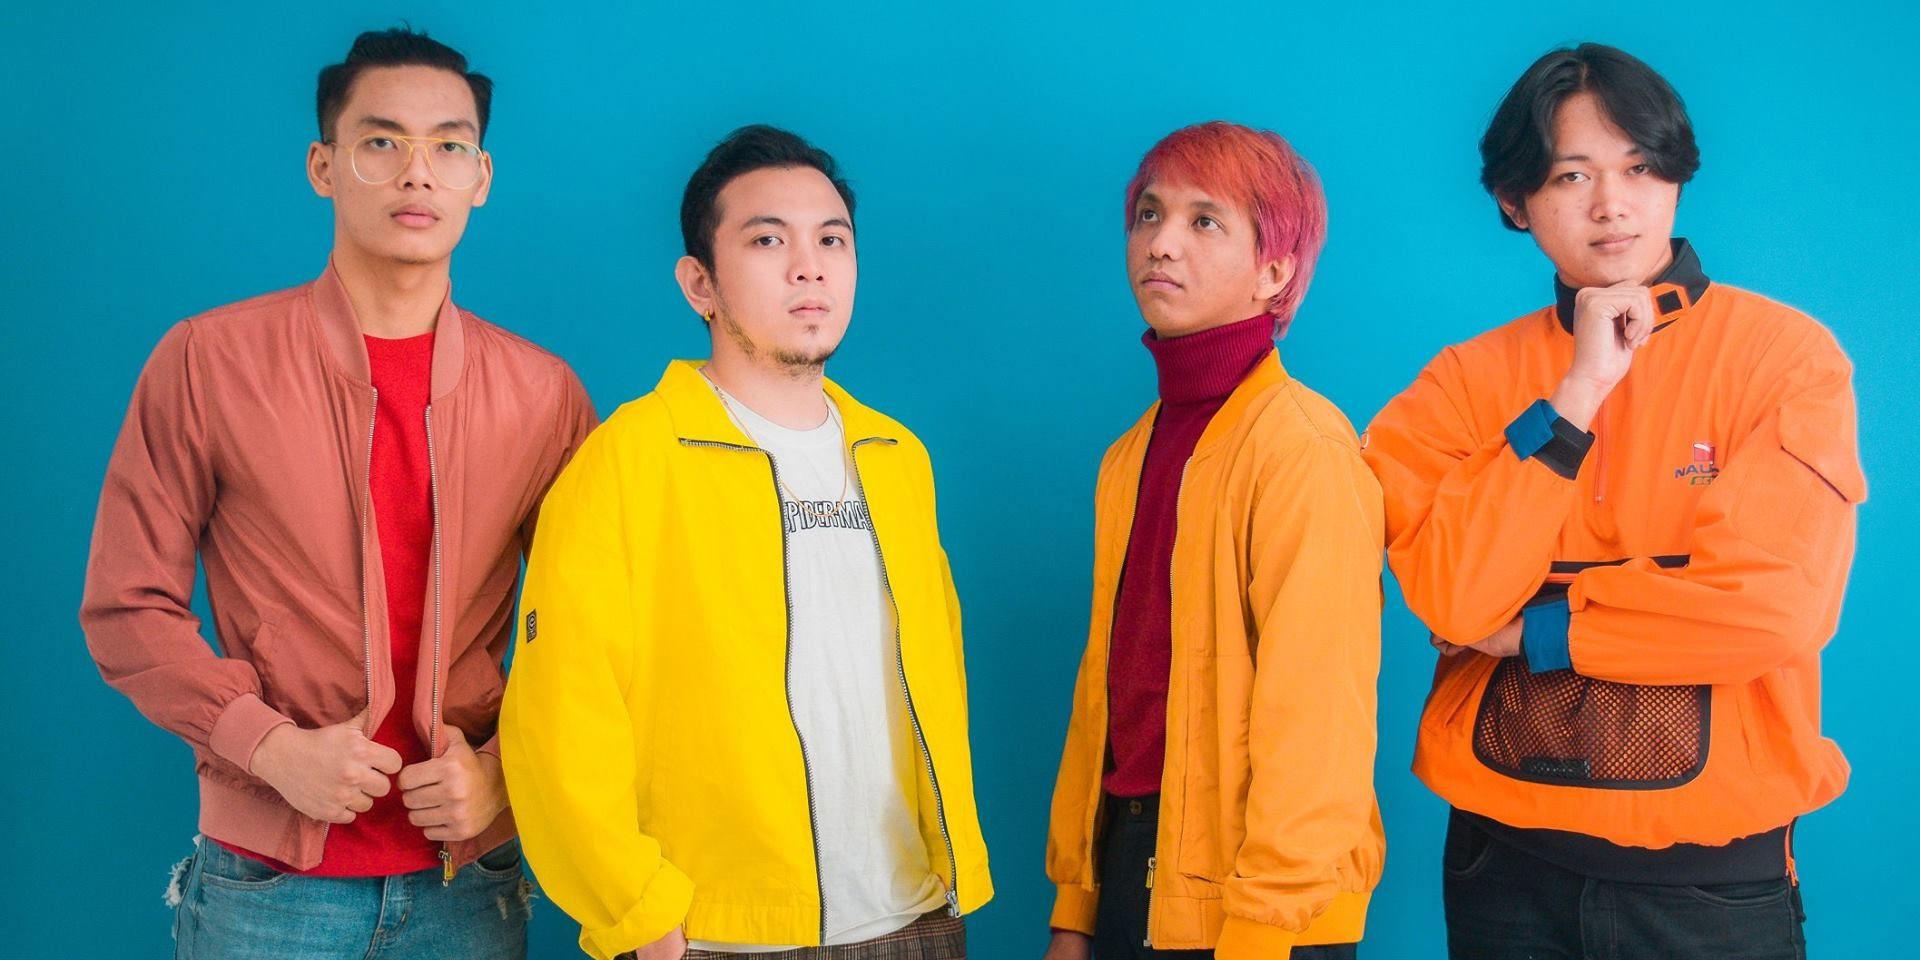 Calein release new single 'Umaasa,' co-written by Unique – listen